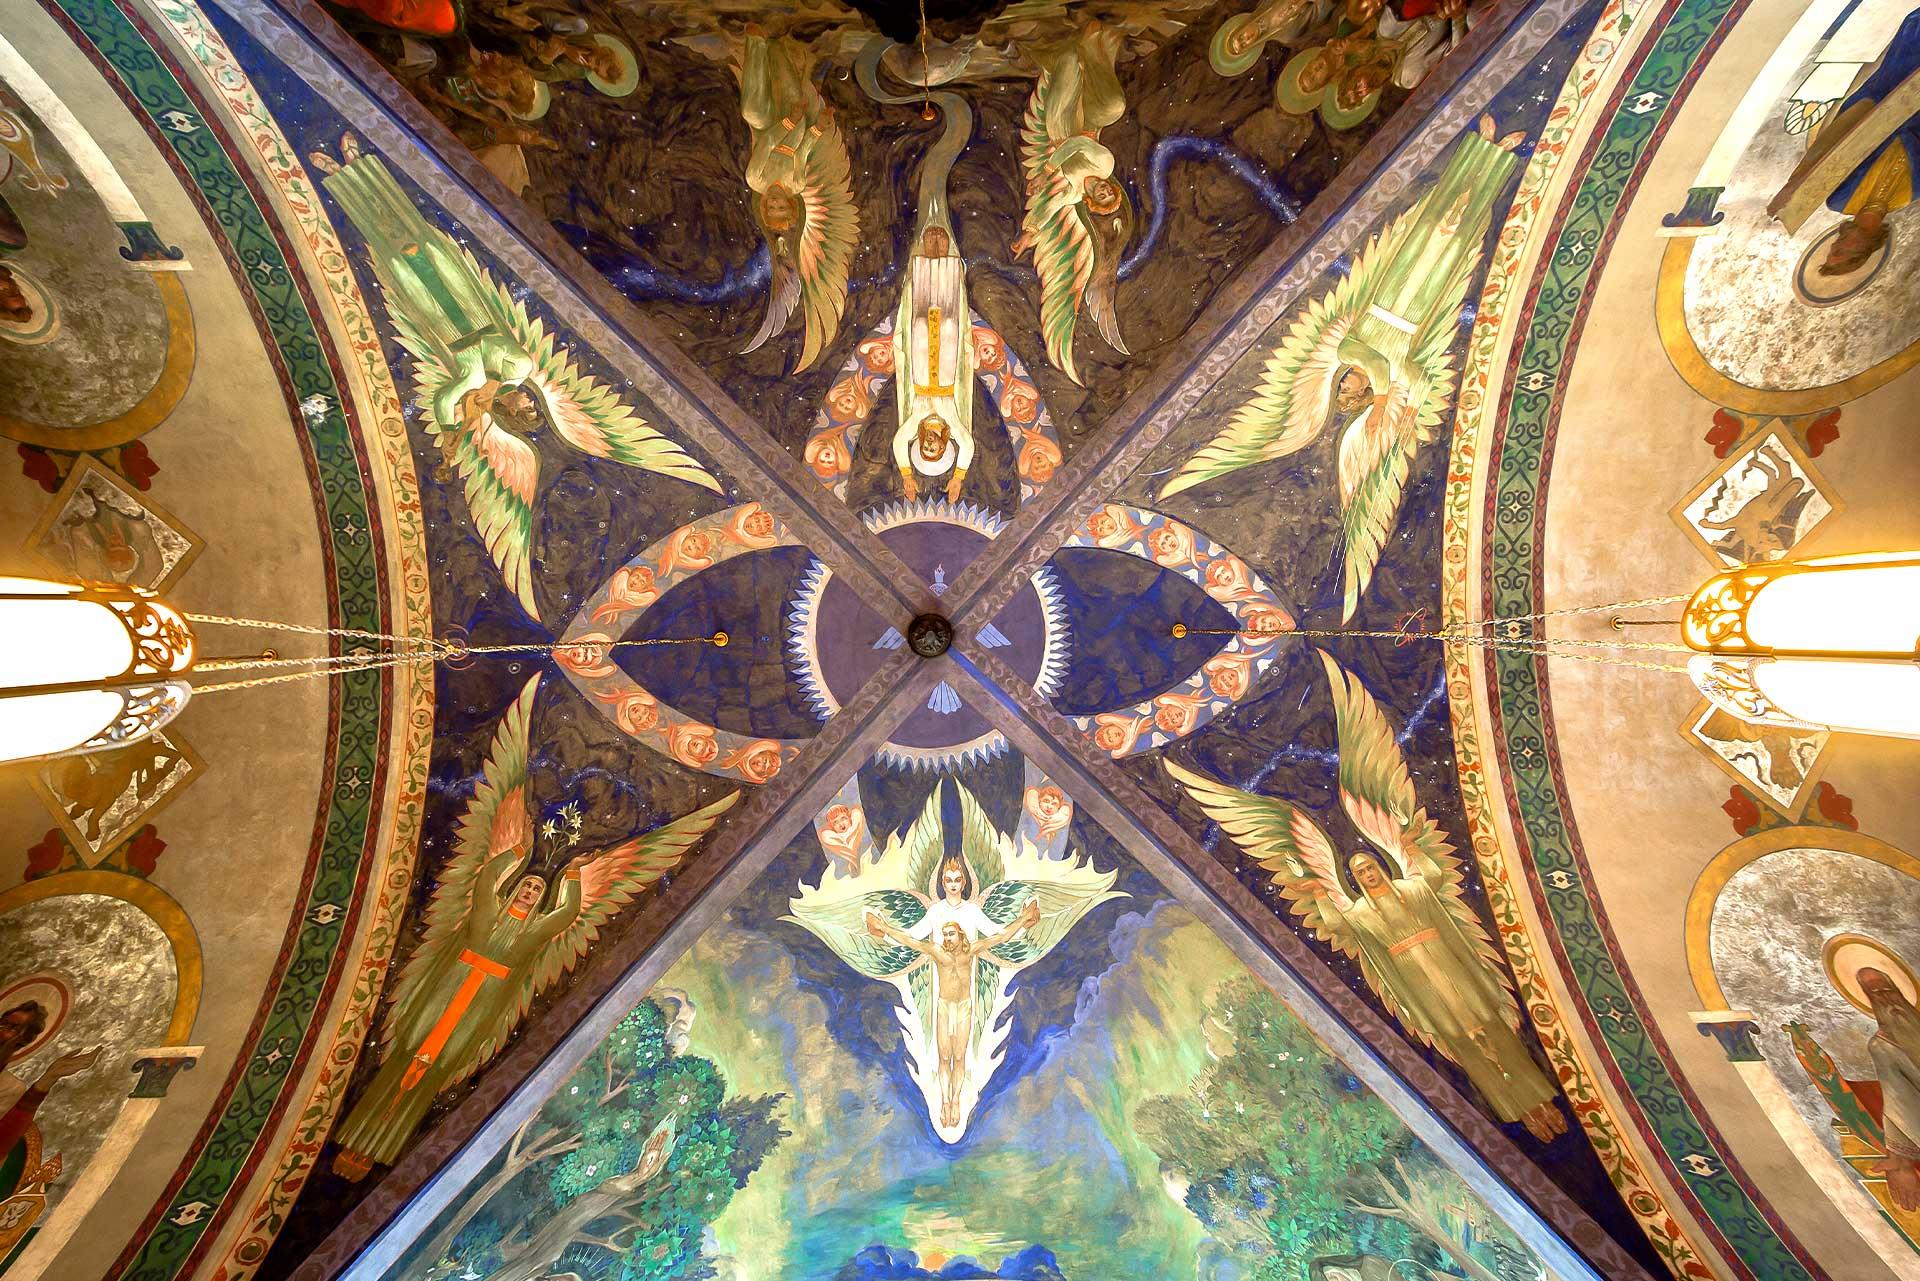 The Transcendent Vision Mural Ceiling